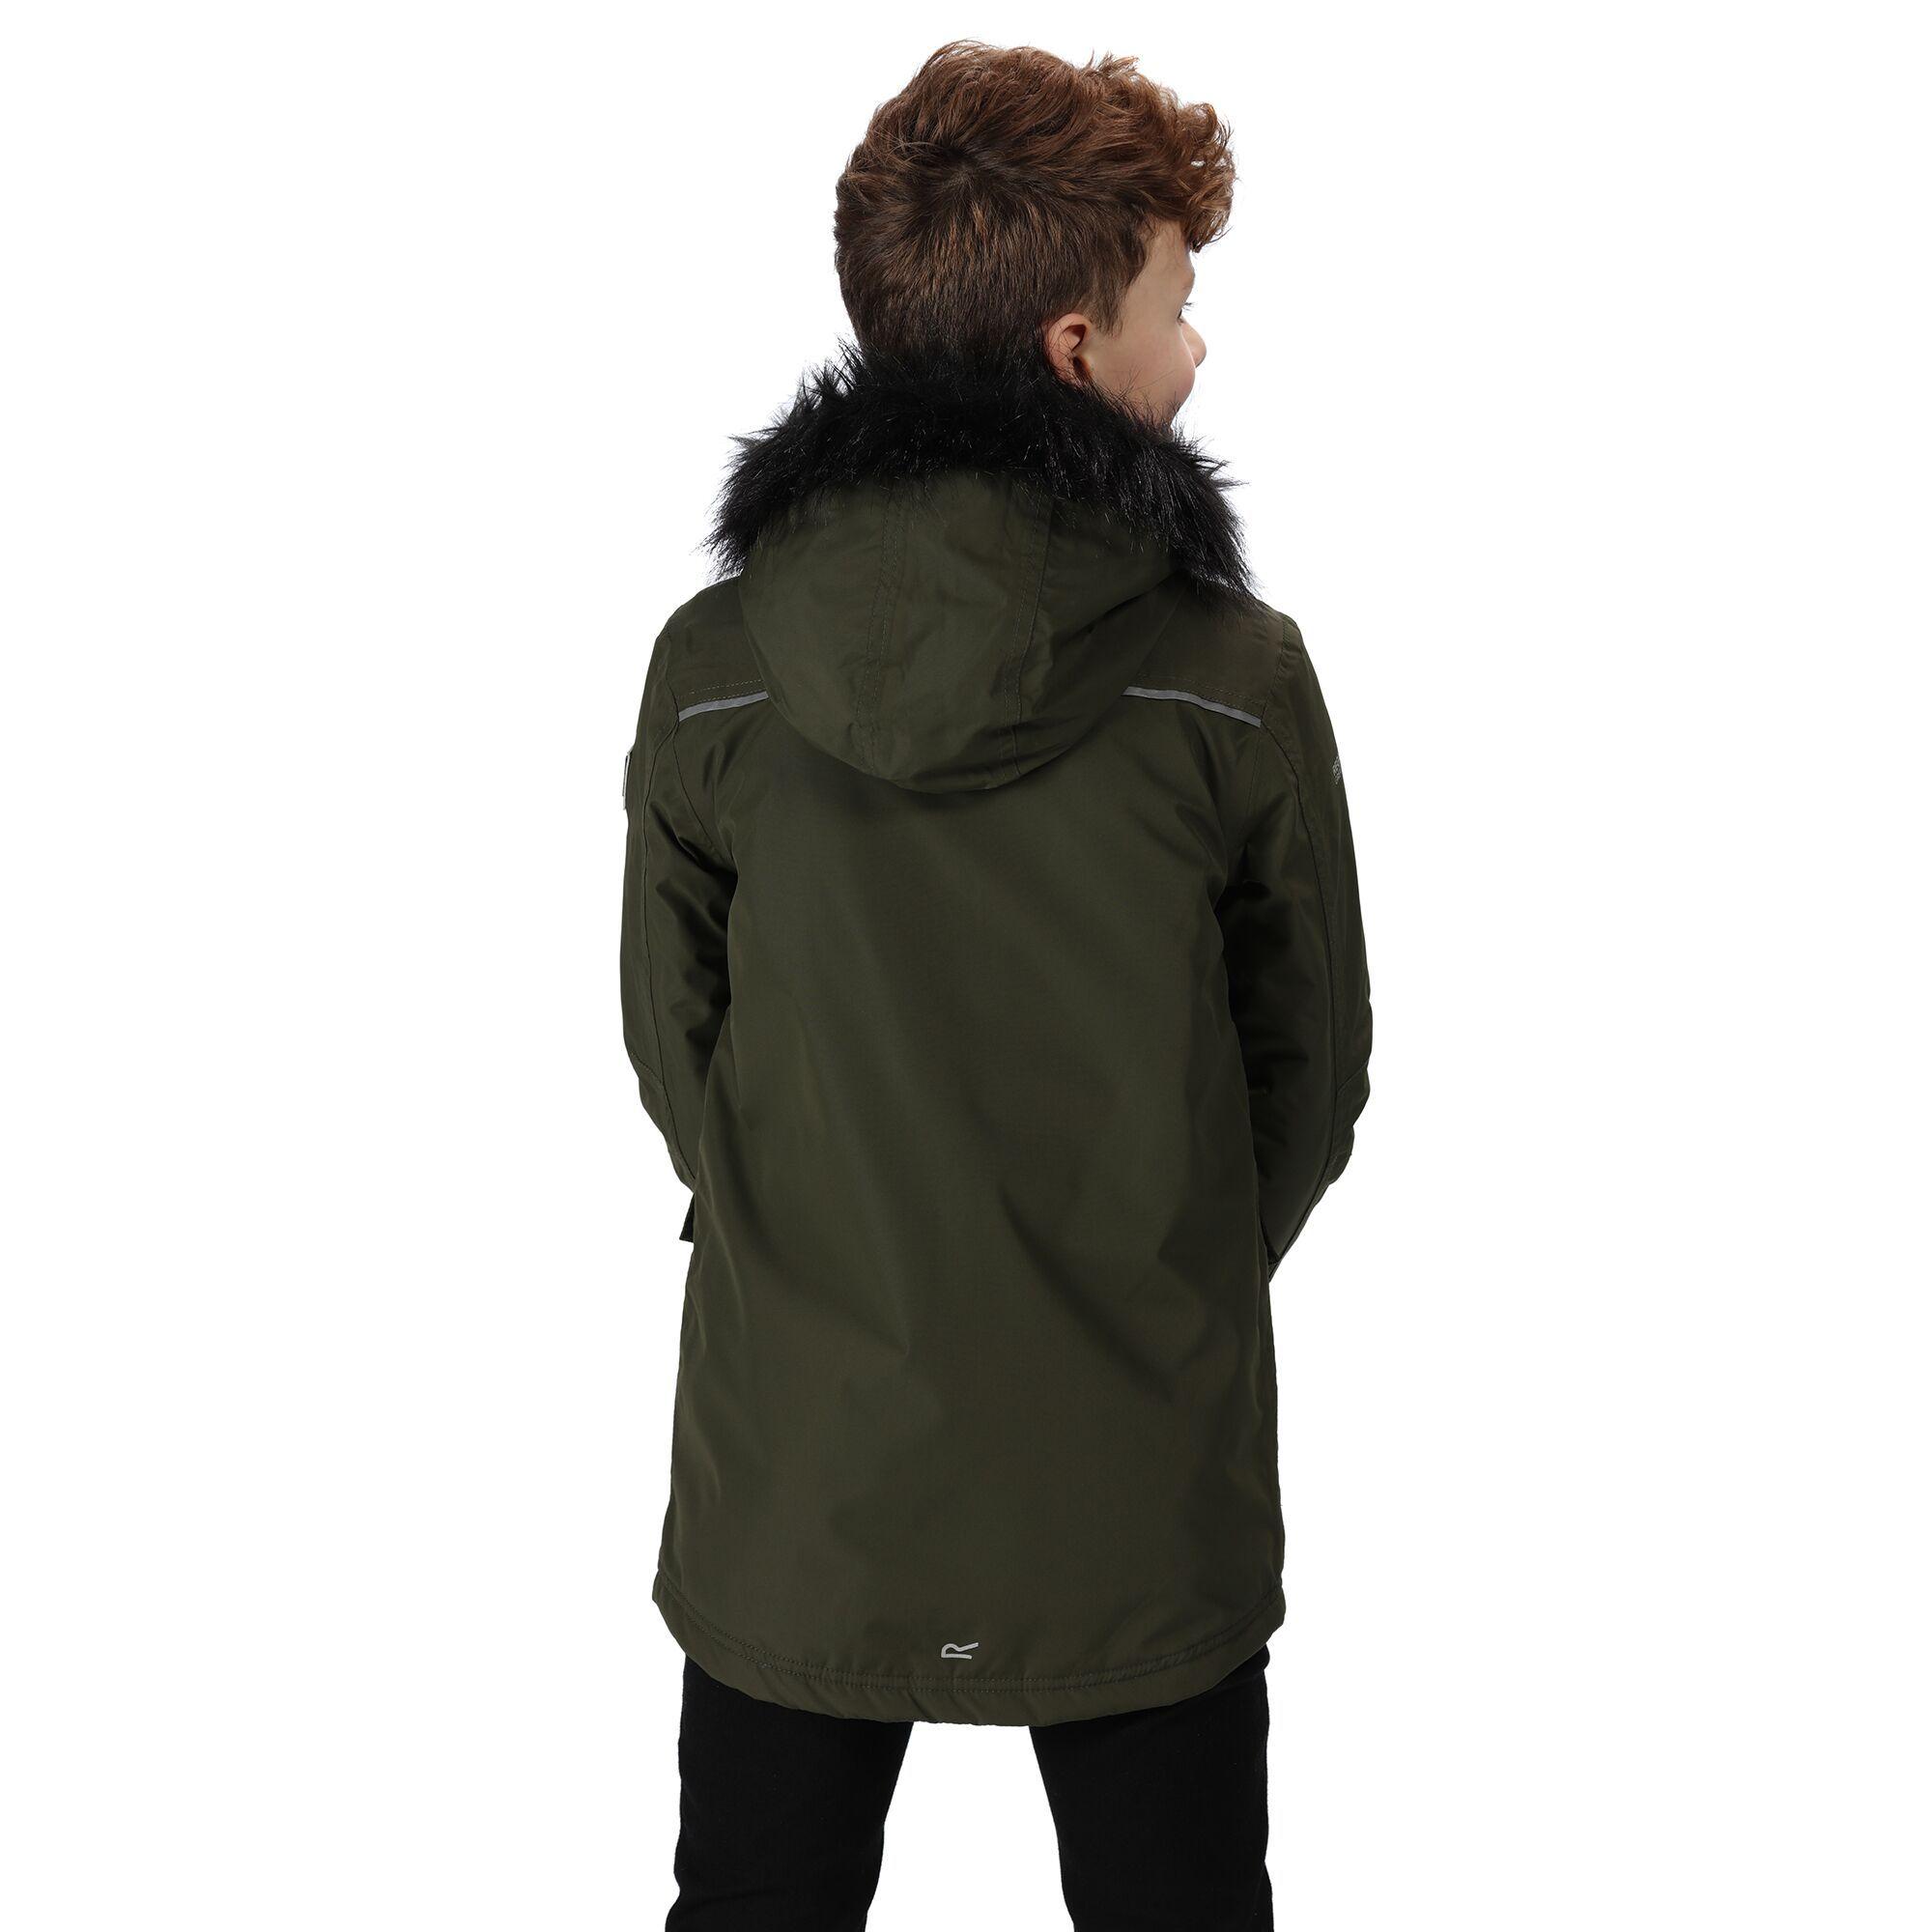 Regatta Childrens/Kids Proktor Waterproof Parka Jacket